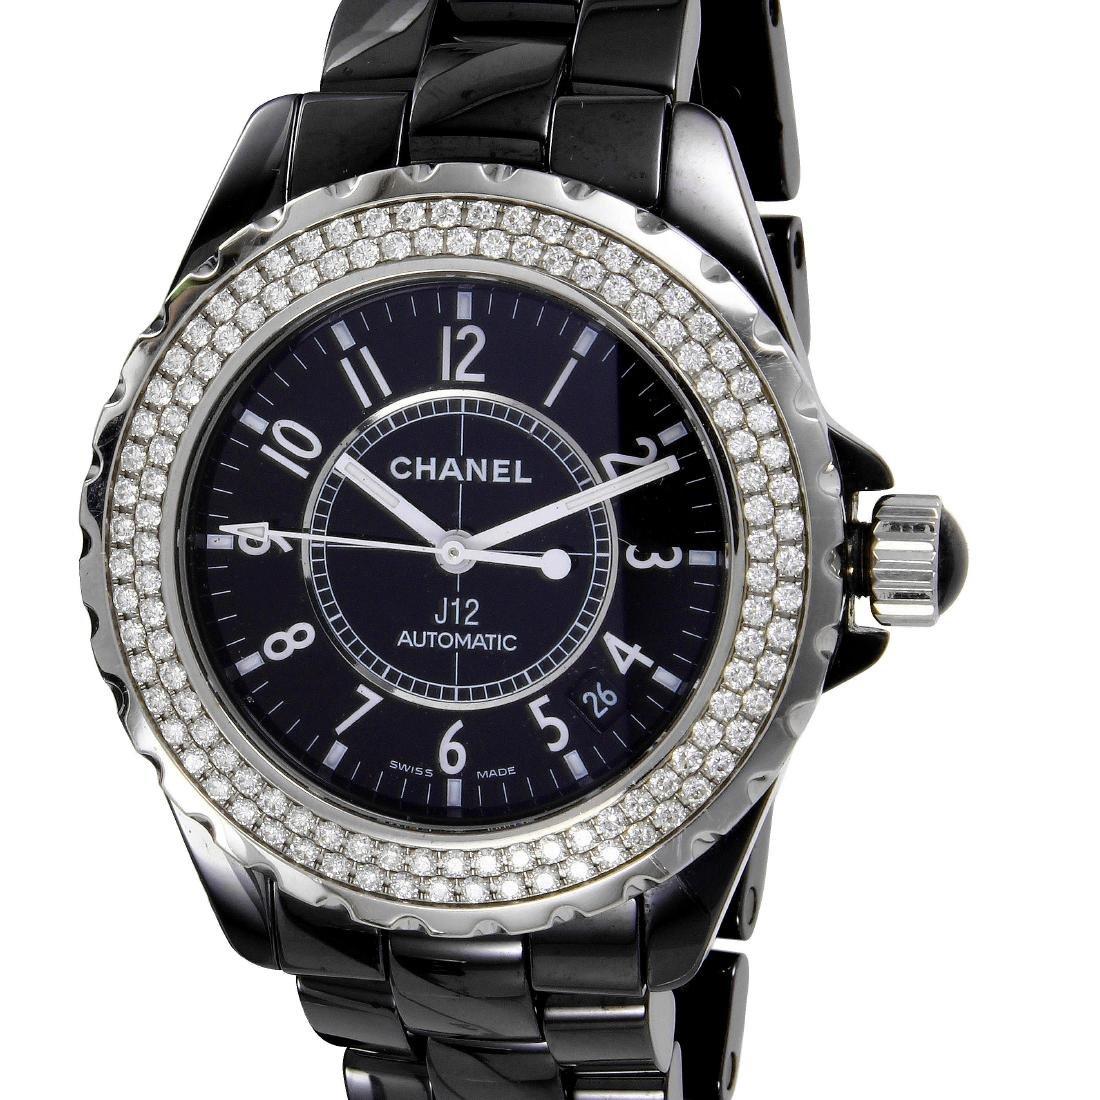 CHANEL J12 Watch Ceramic Ladies Diamond Automatic L951